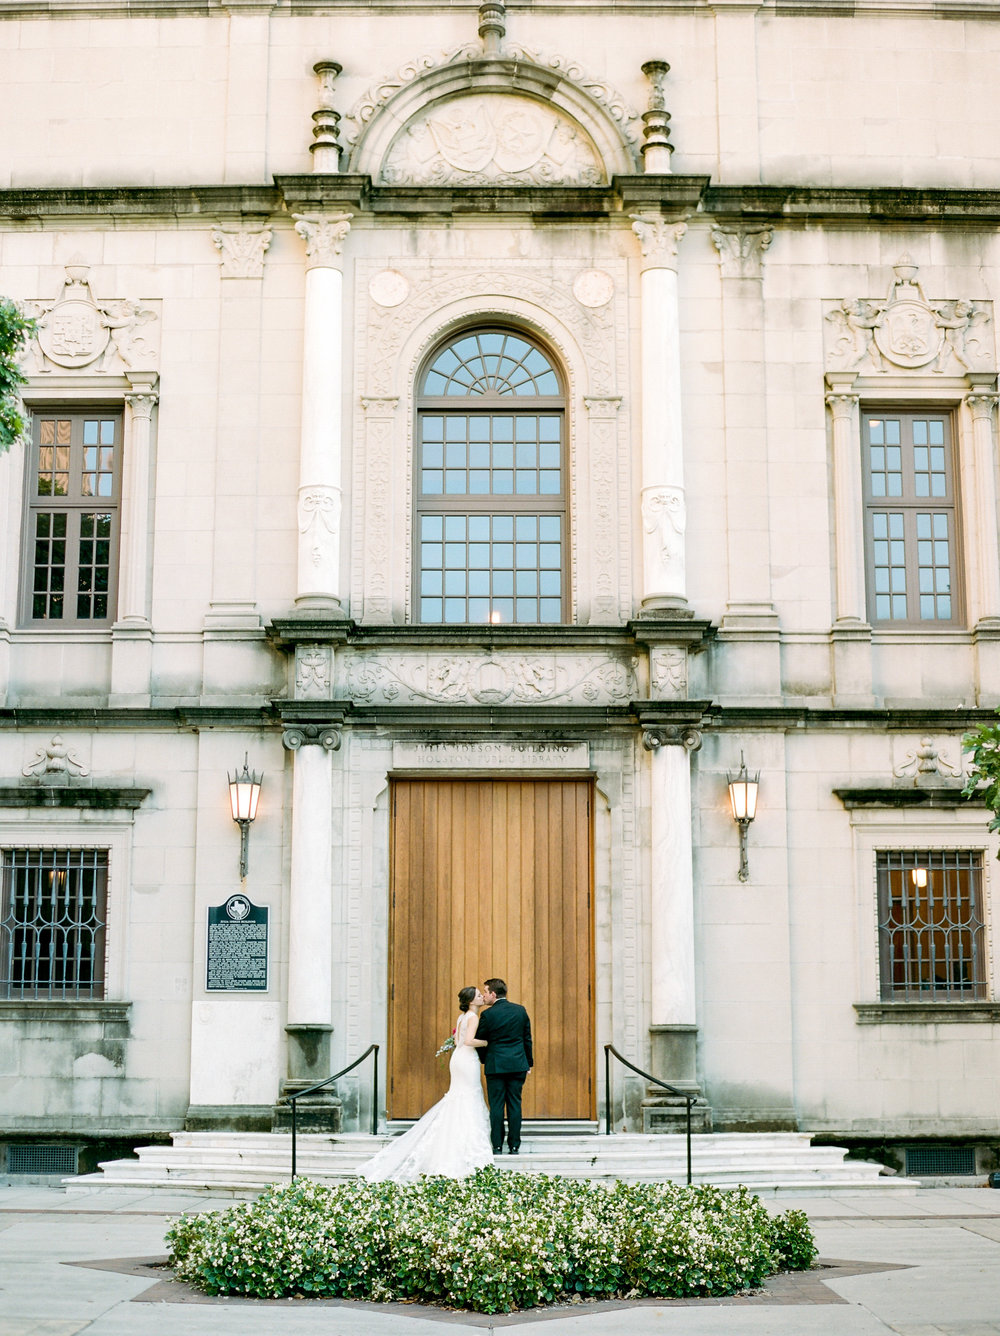 The-Knot-Texas-Fine-Art-Wedding-Film-Destination-Photographer-Houston-Austin-Dallas-New-Orleans-Julia-Ideson-Library-Event-Dana-Josh-Fernandez-Photograph-Top-Best-44.jpg